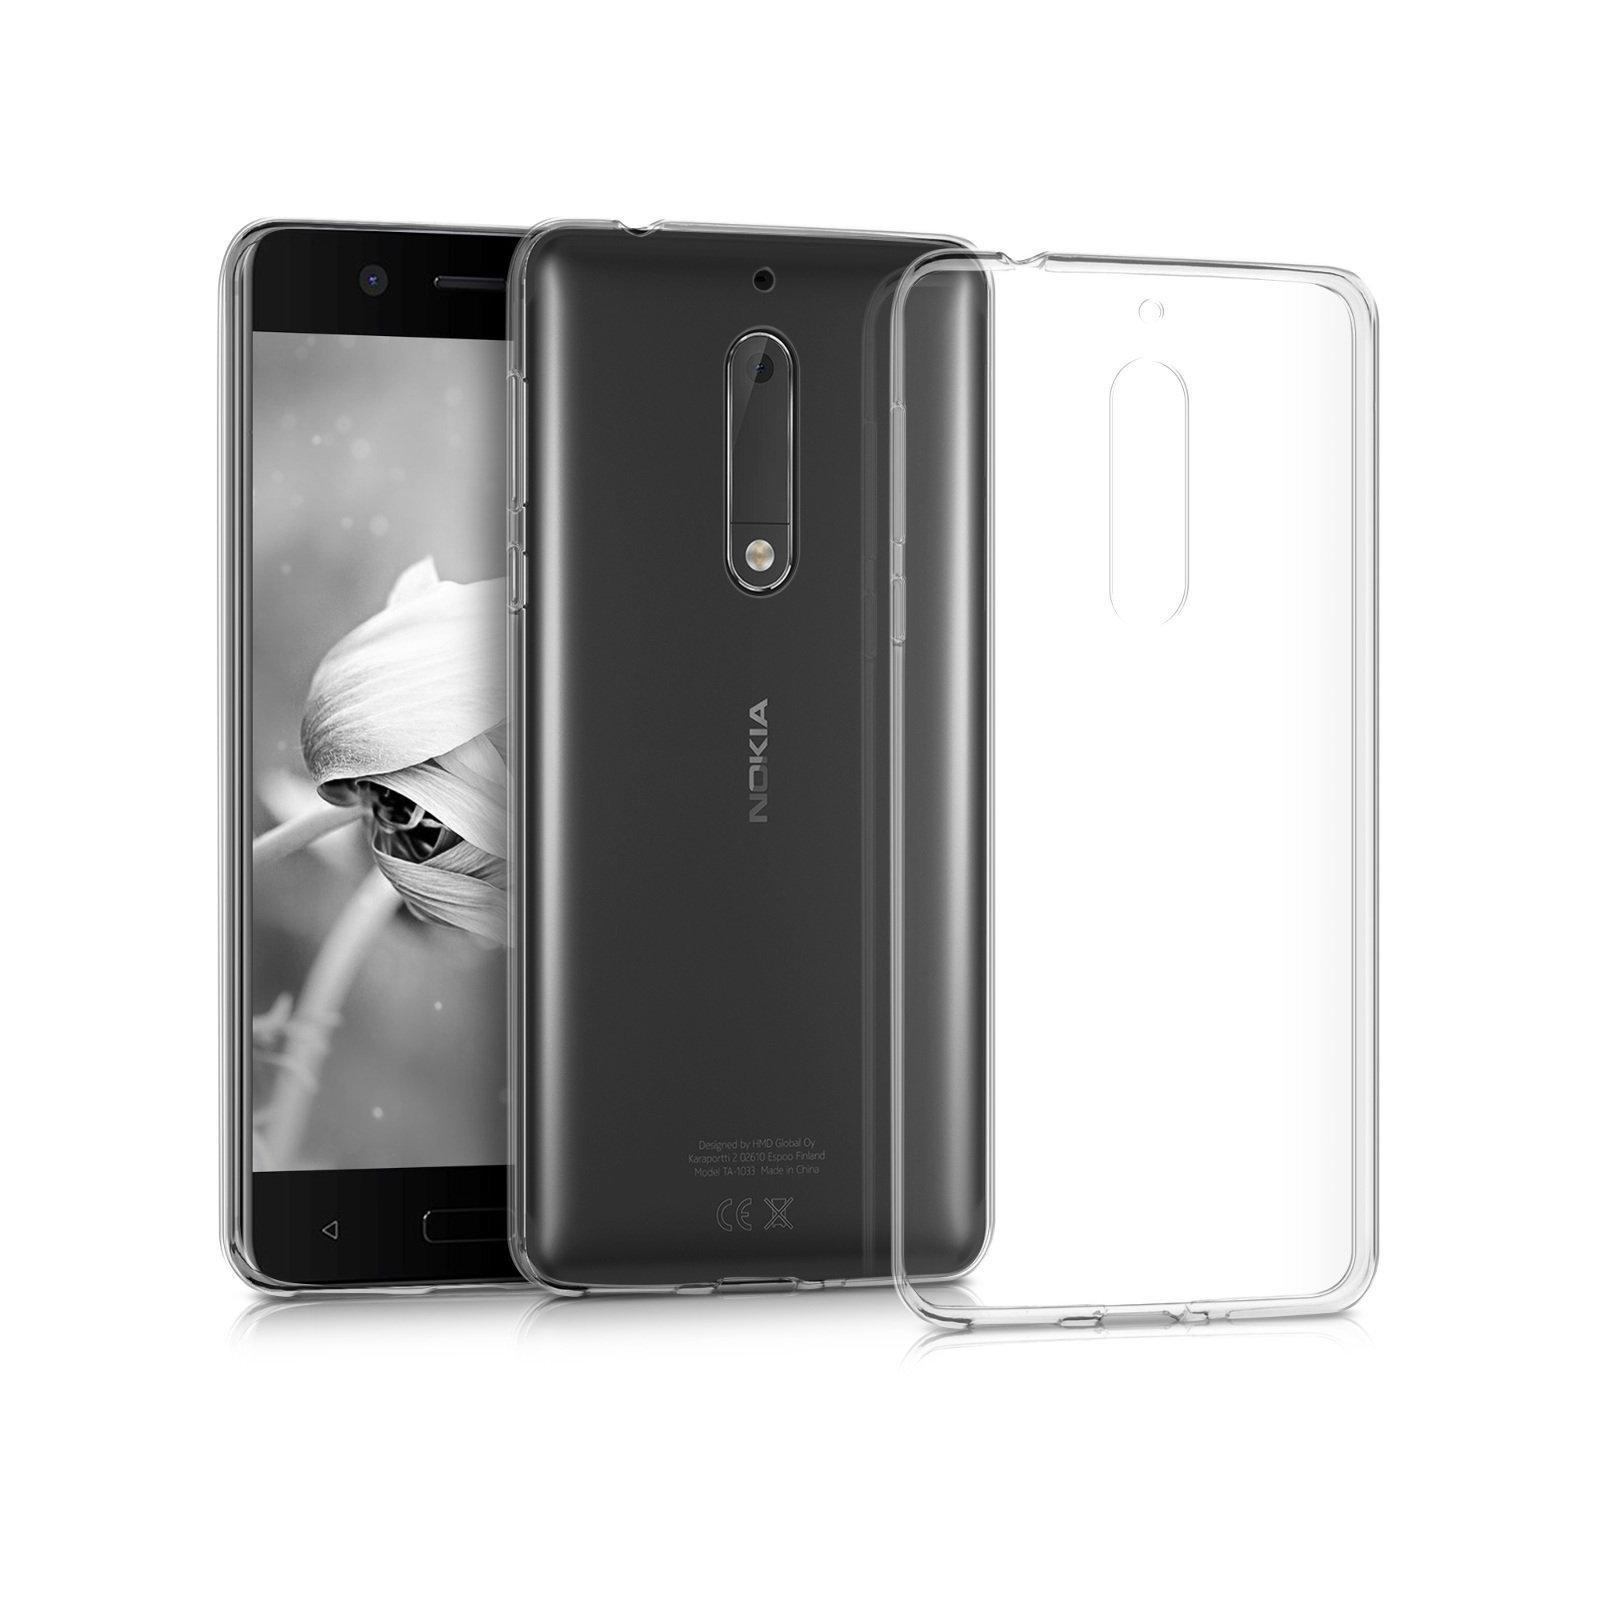 Чехол для моб. телефона SmartCase Nokia 5 TPU Clear (SC-N5) изображение 2